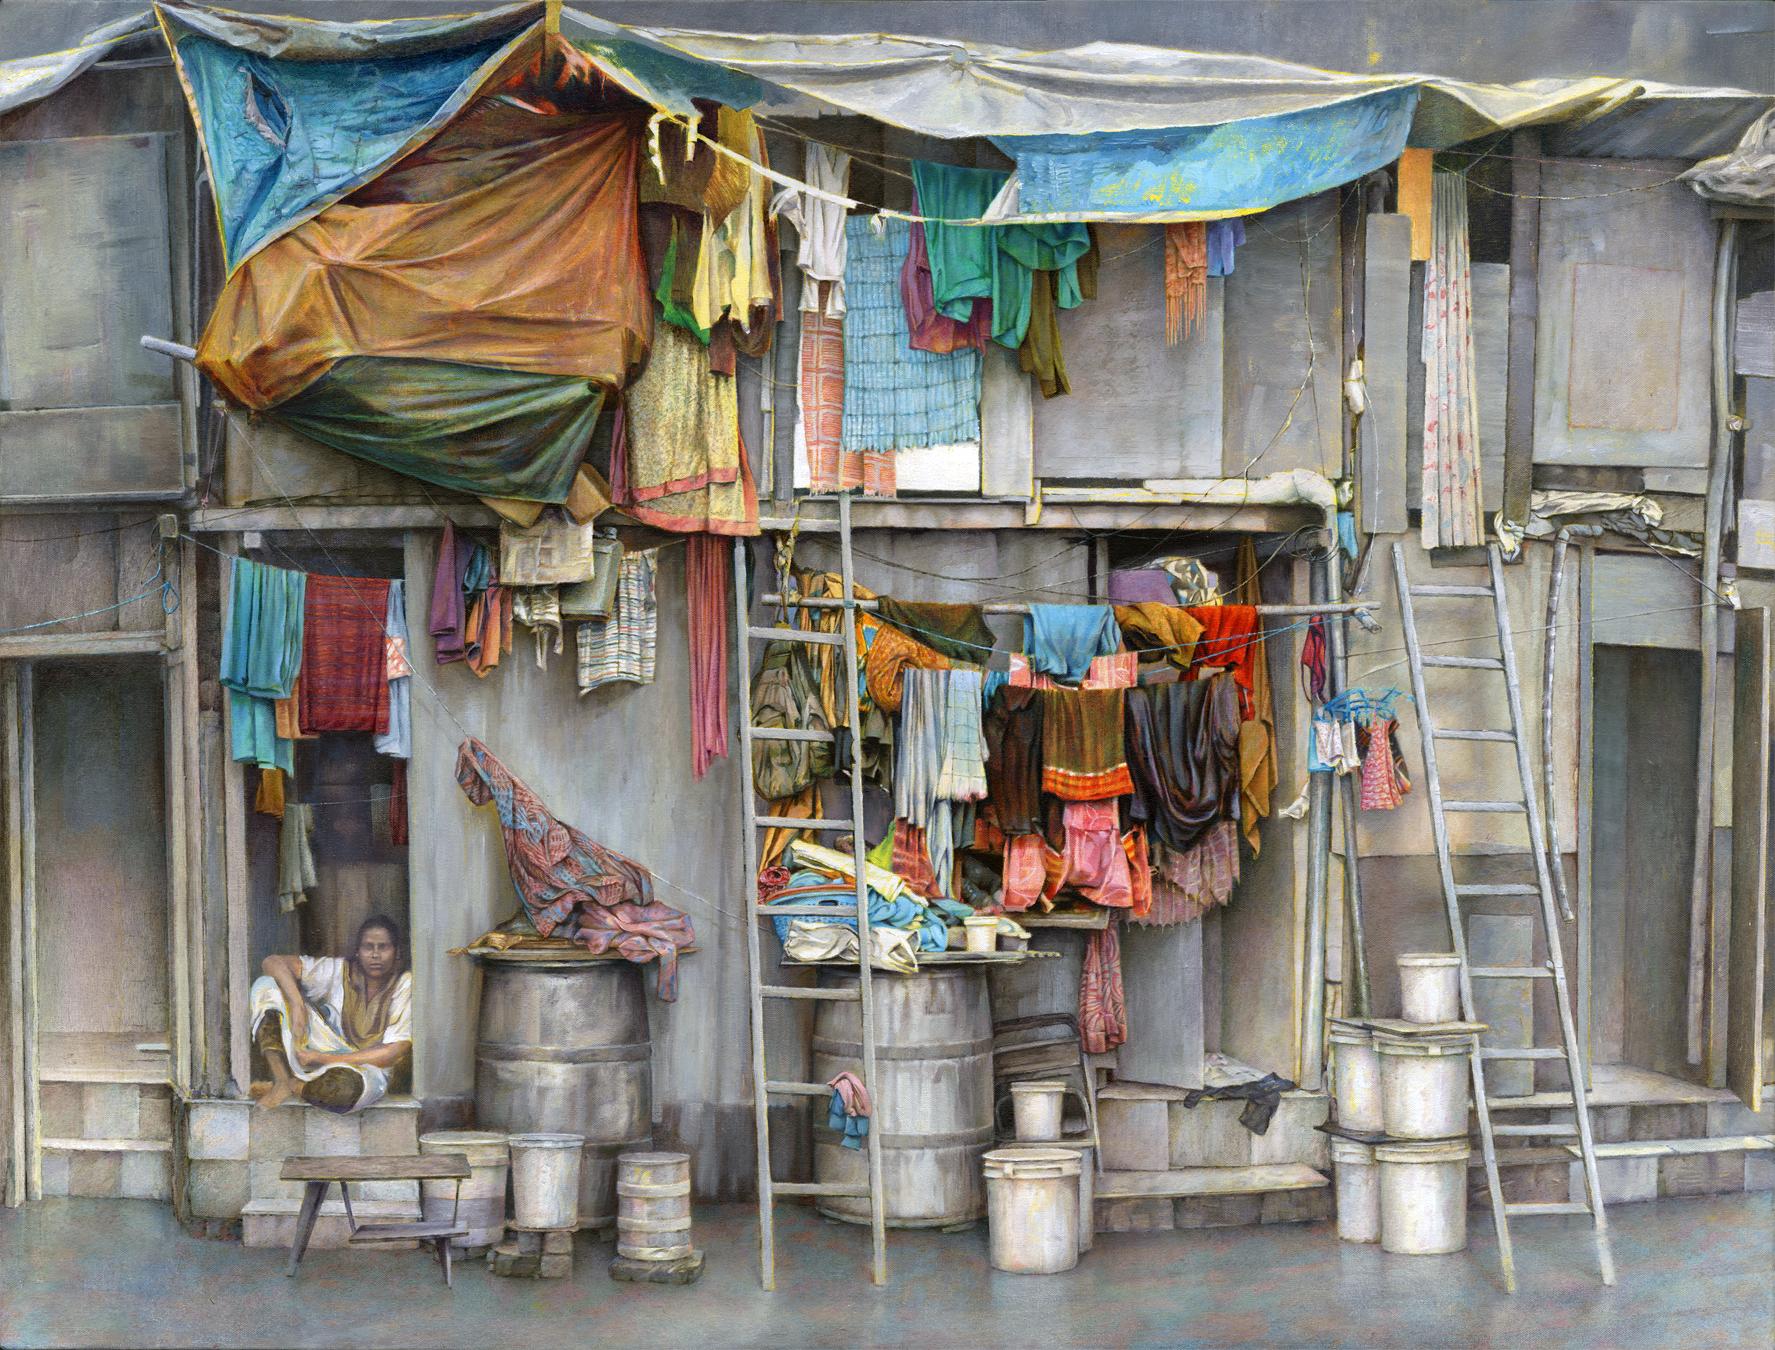 David Agenjo, Wadibunder Road, Oil on canvas, 90 x 120 x 3 cm,  https://davidagenjo.com